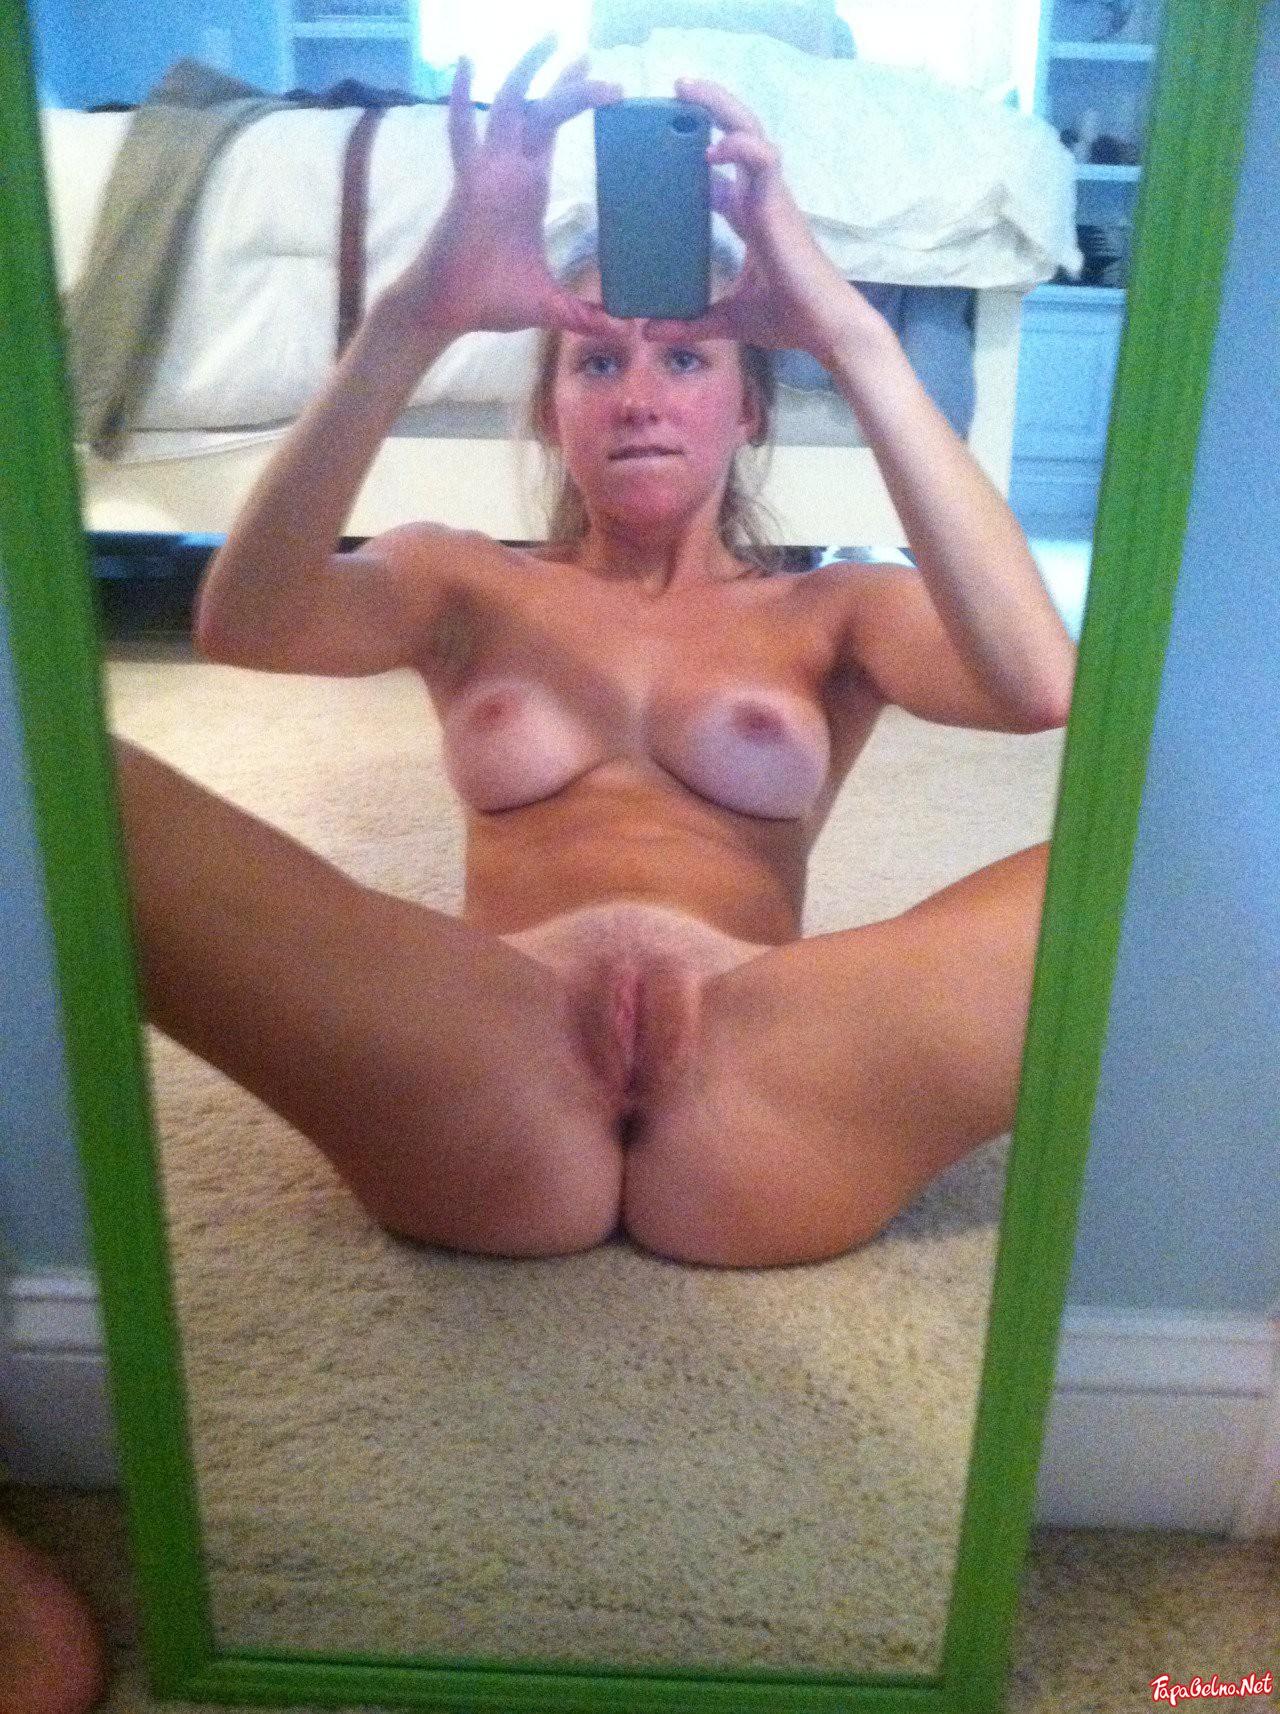 Ebony Mirror Selfies With Her Amazing Big Tits